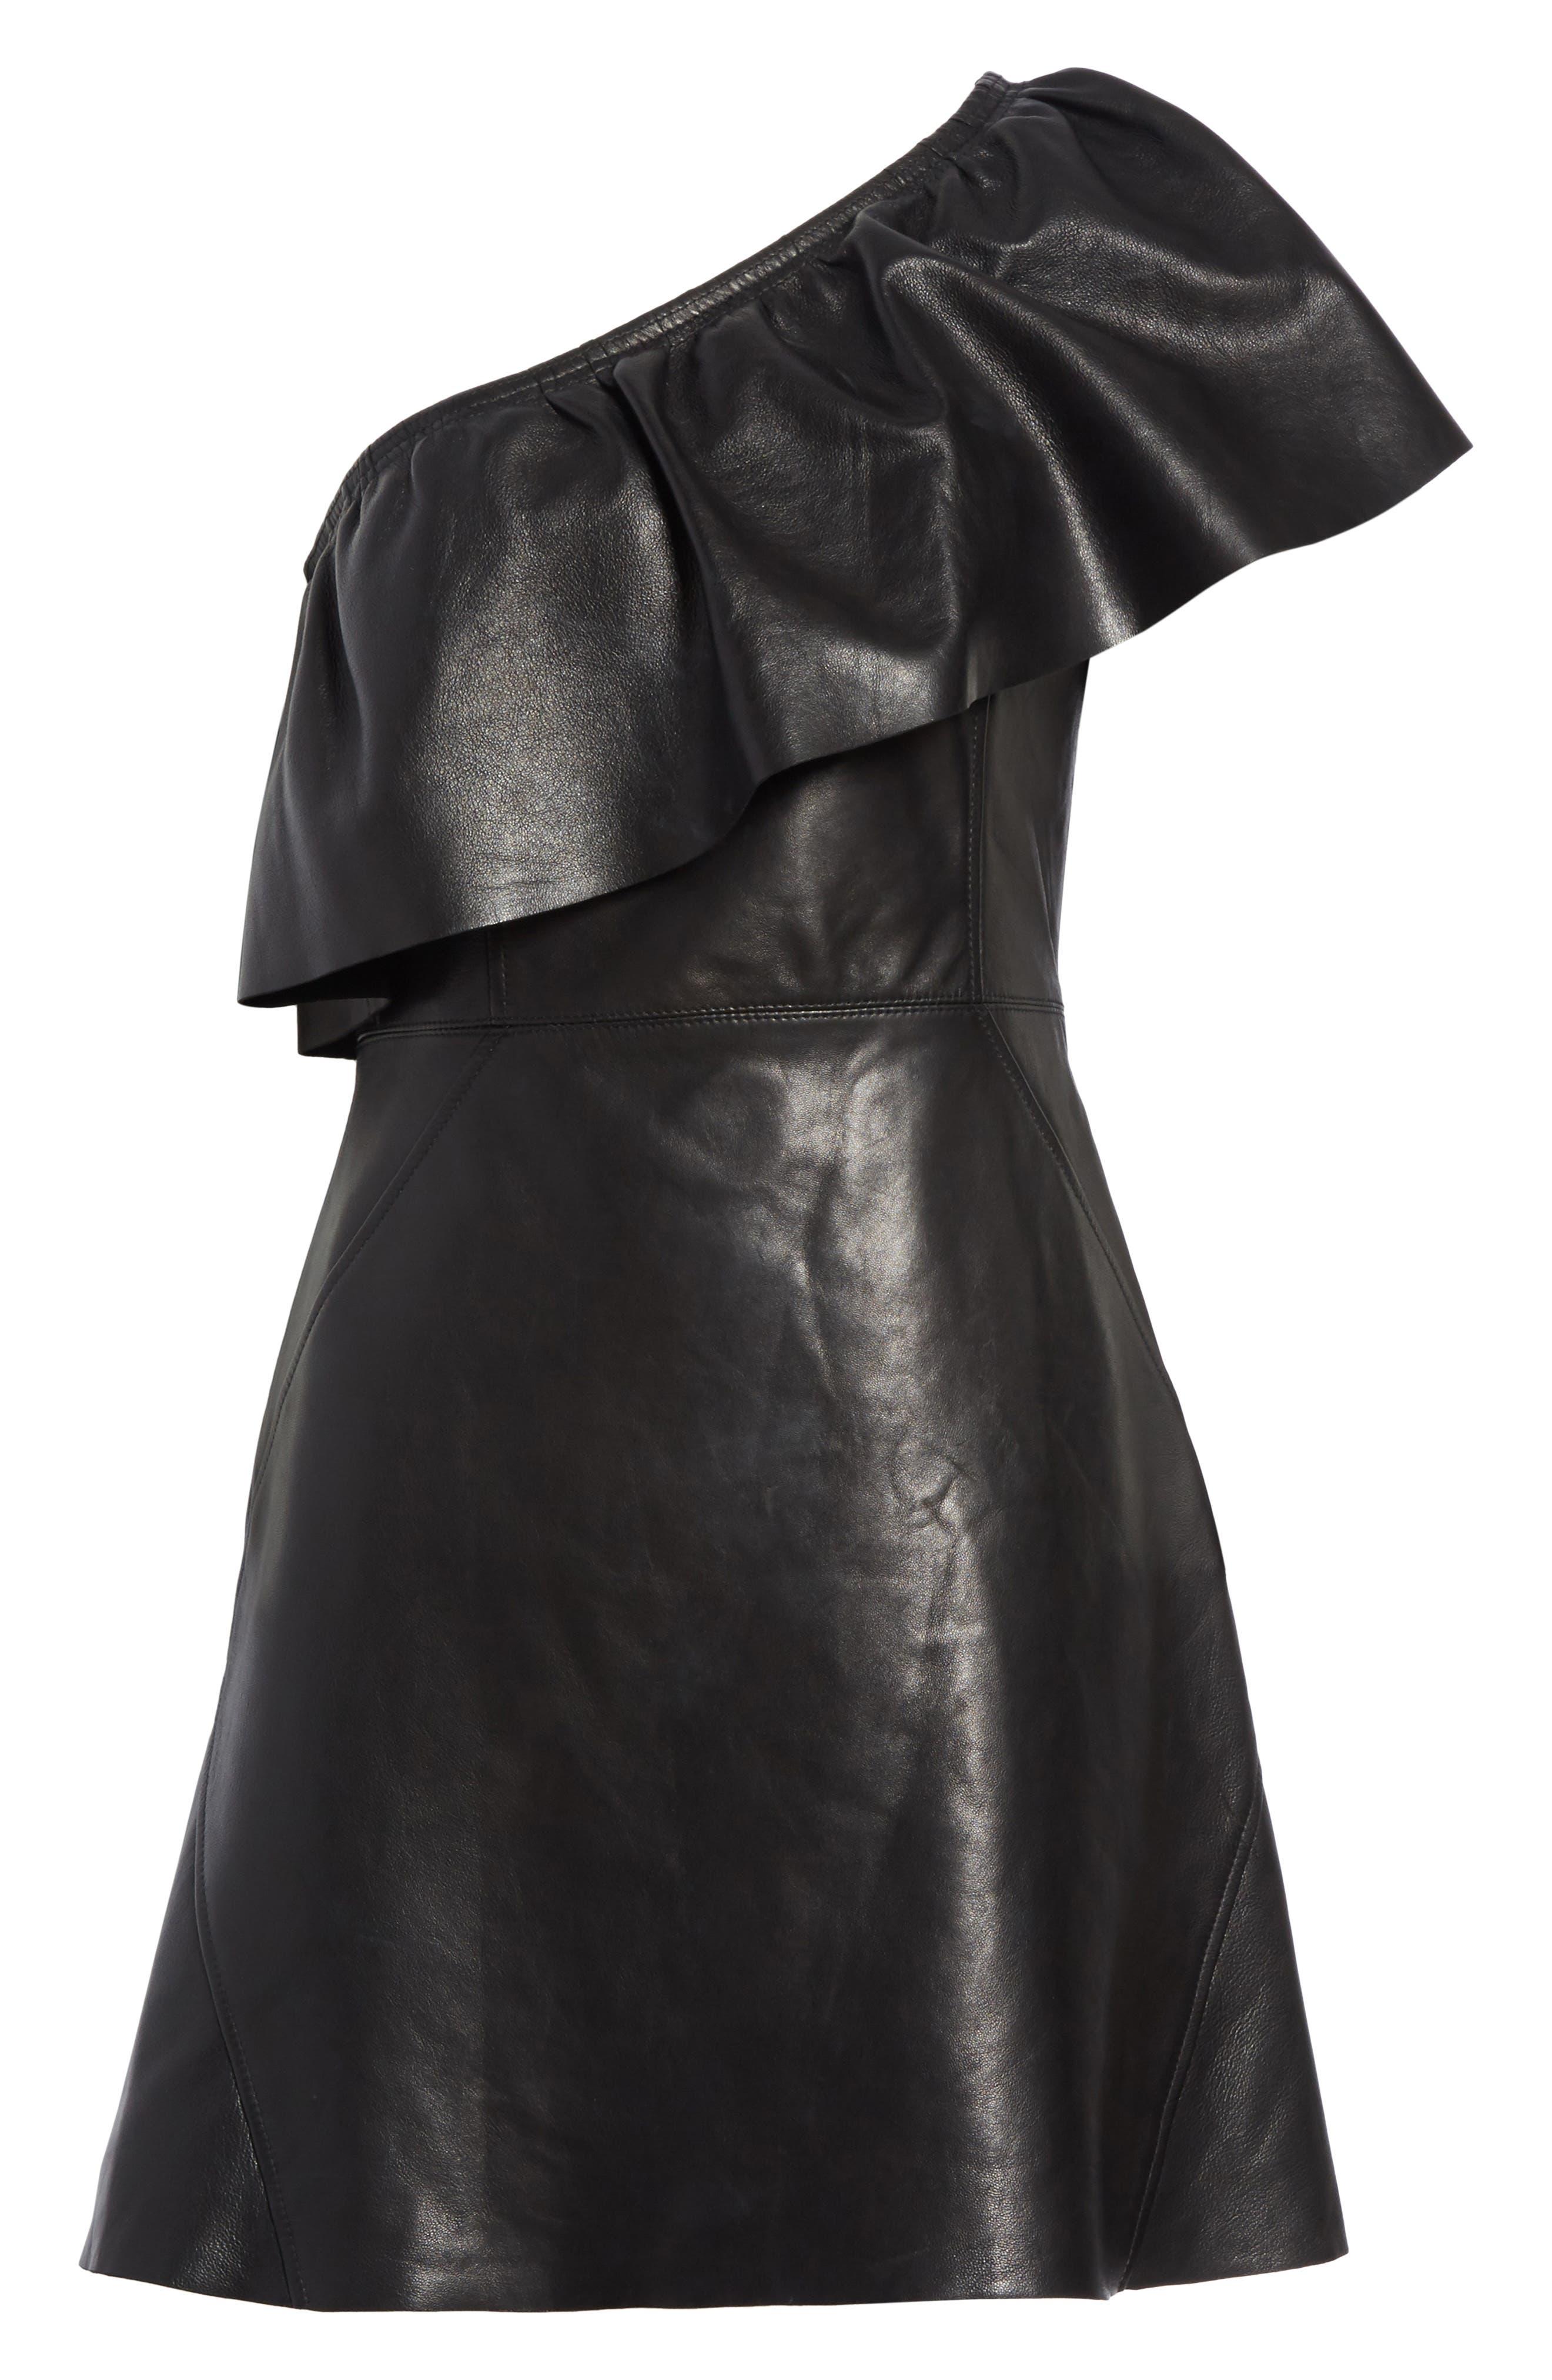 Kahlo Ruffle One-Shoulder Leather Dress,                             Alternate thumbnail 6, color,                             001